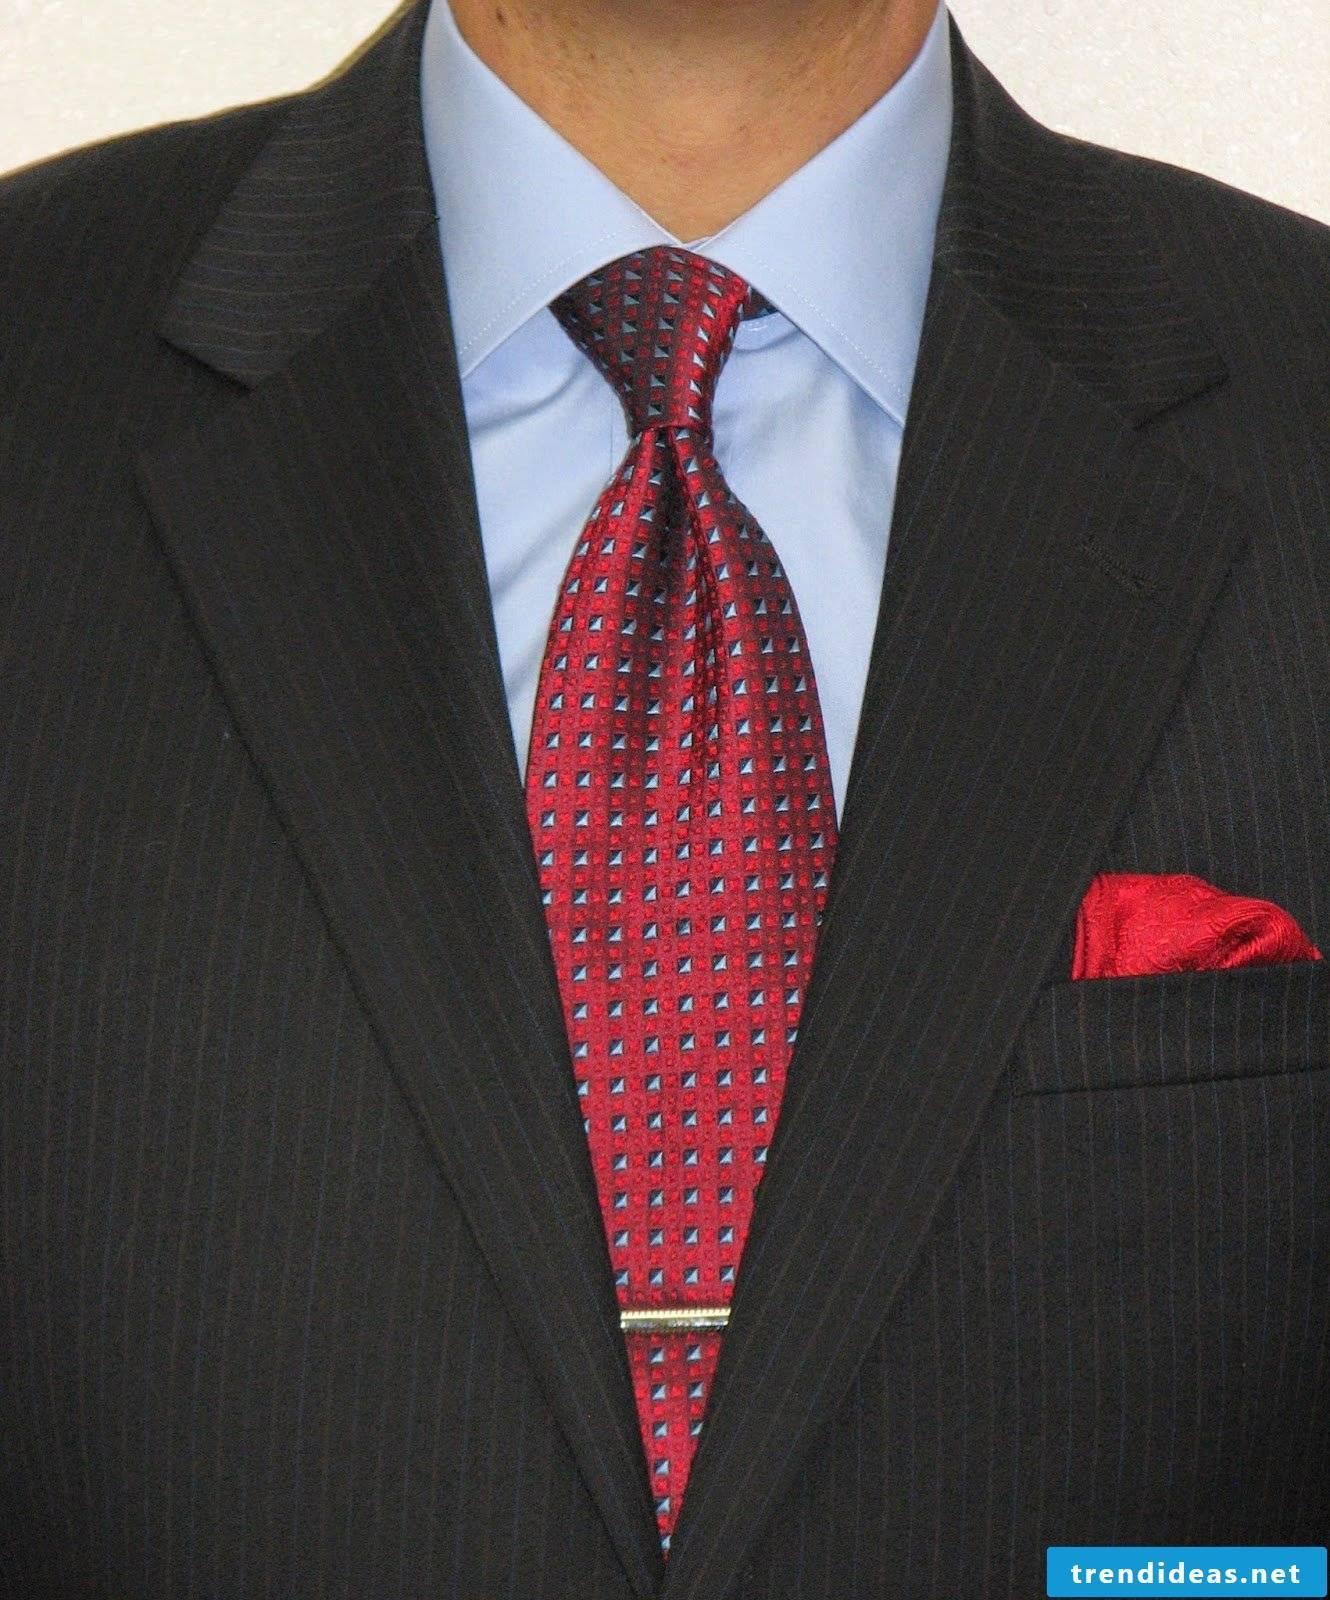 DIY tie knot for beginners